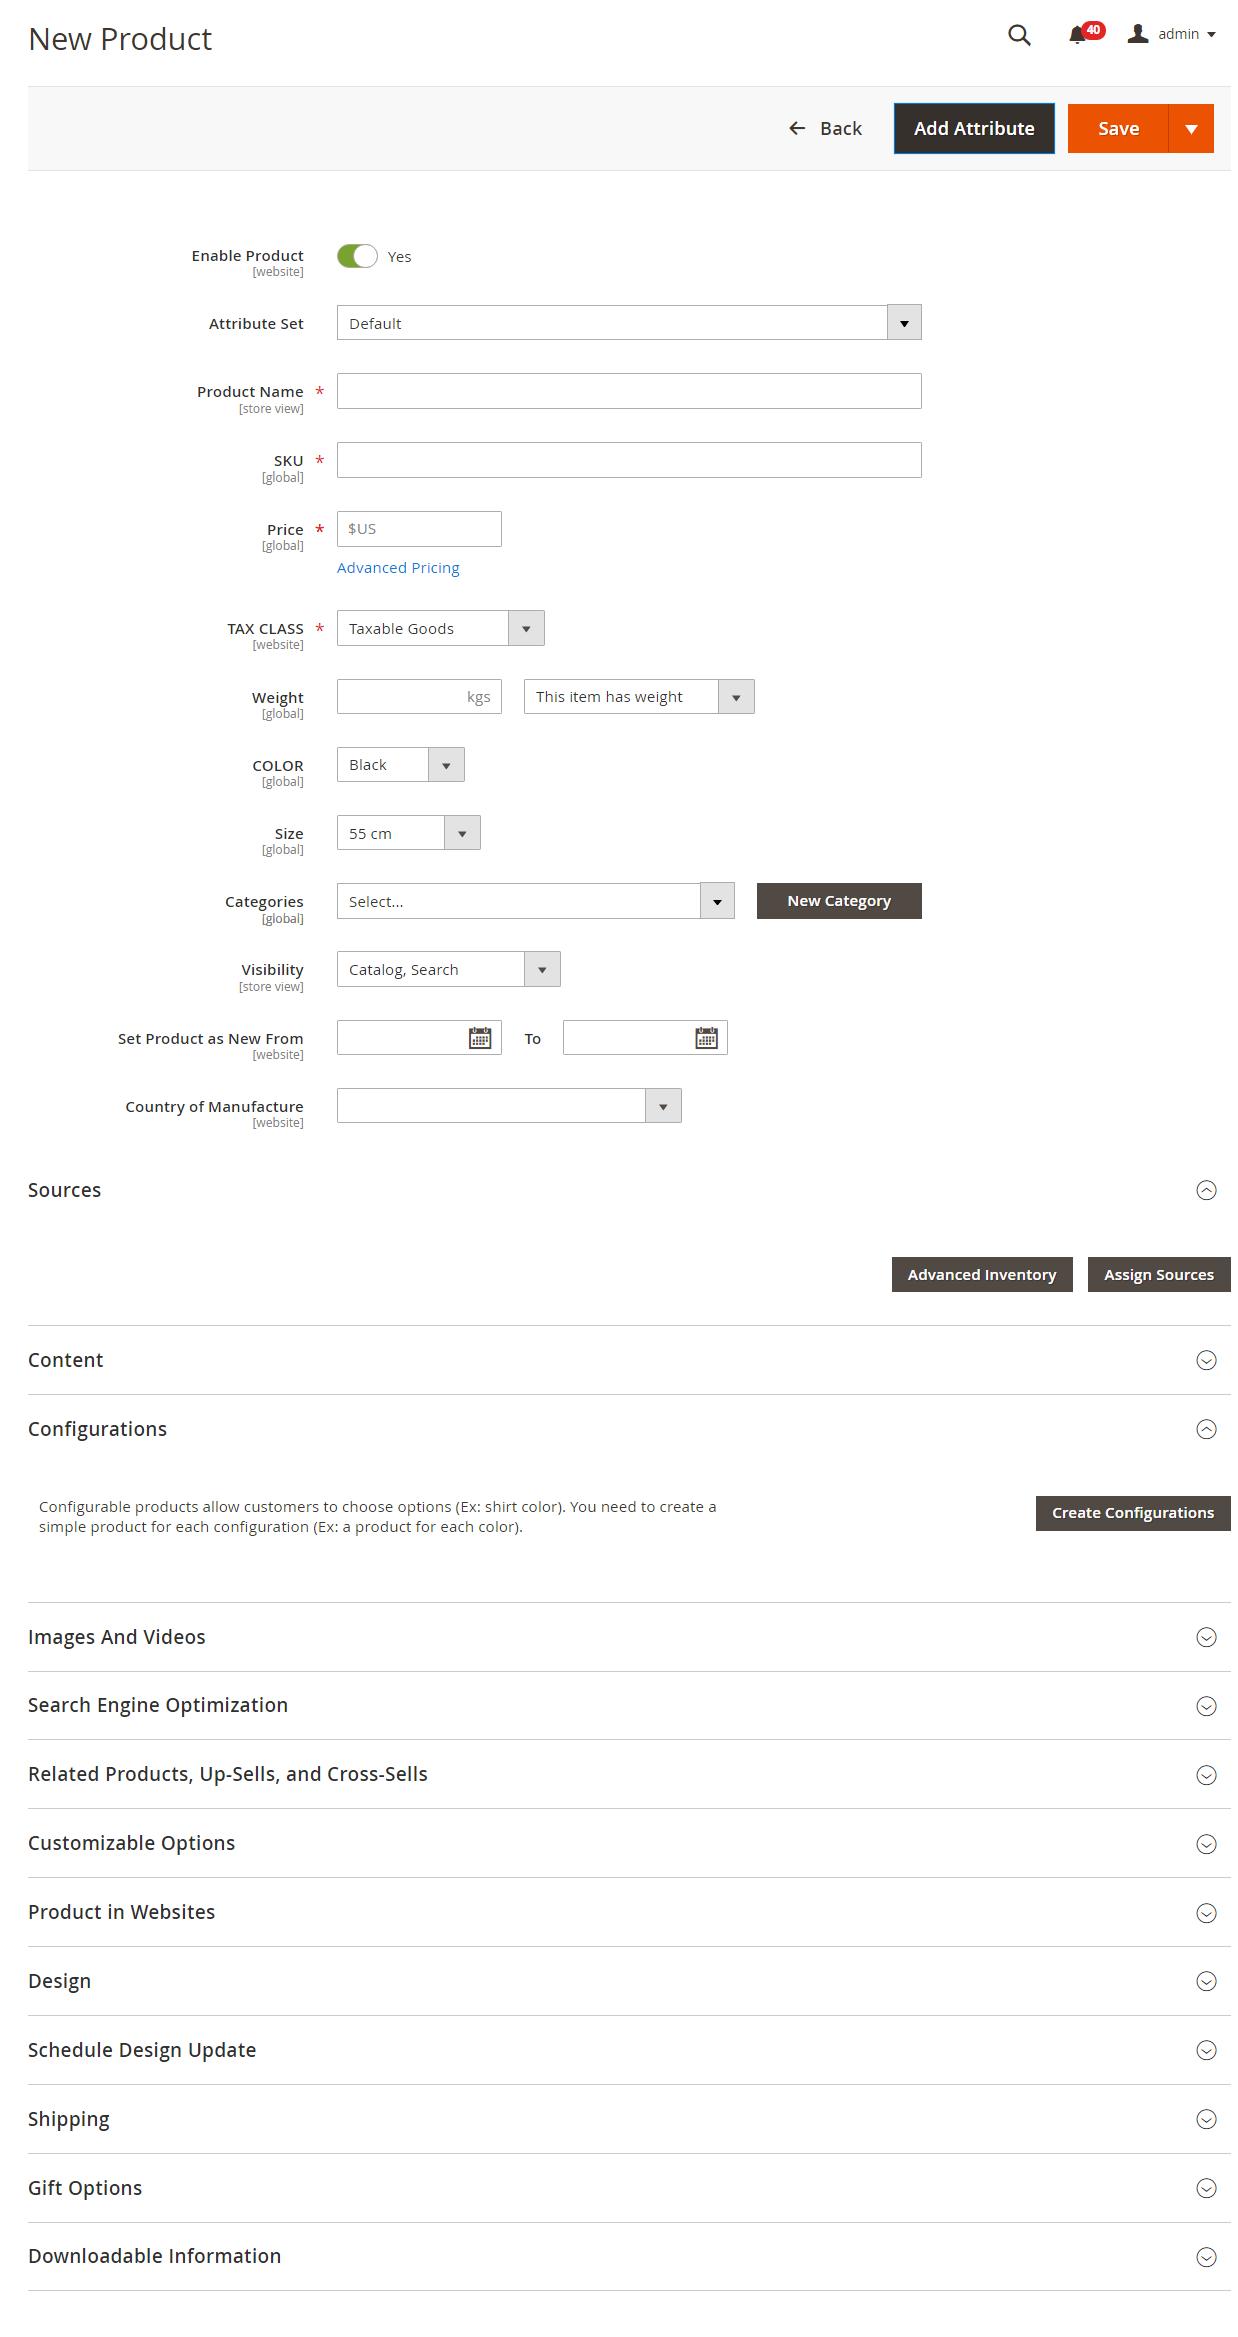 صفحة عمل المنتج (Product Workspace) فى ماجنتو 2